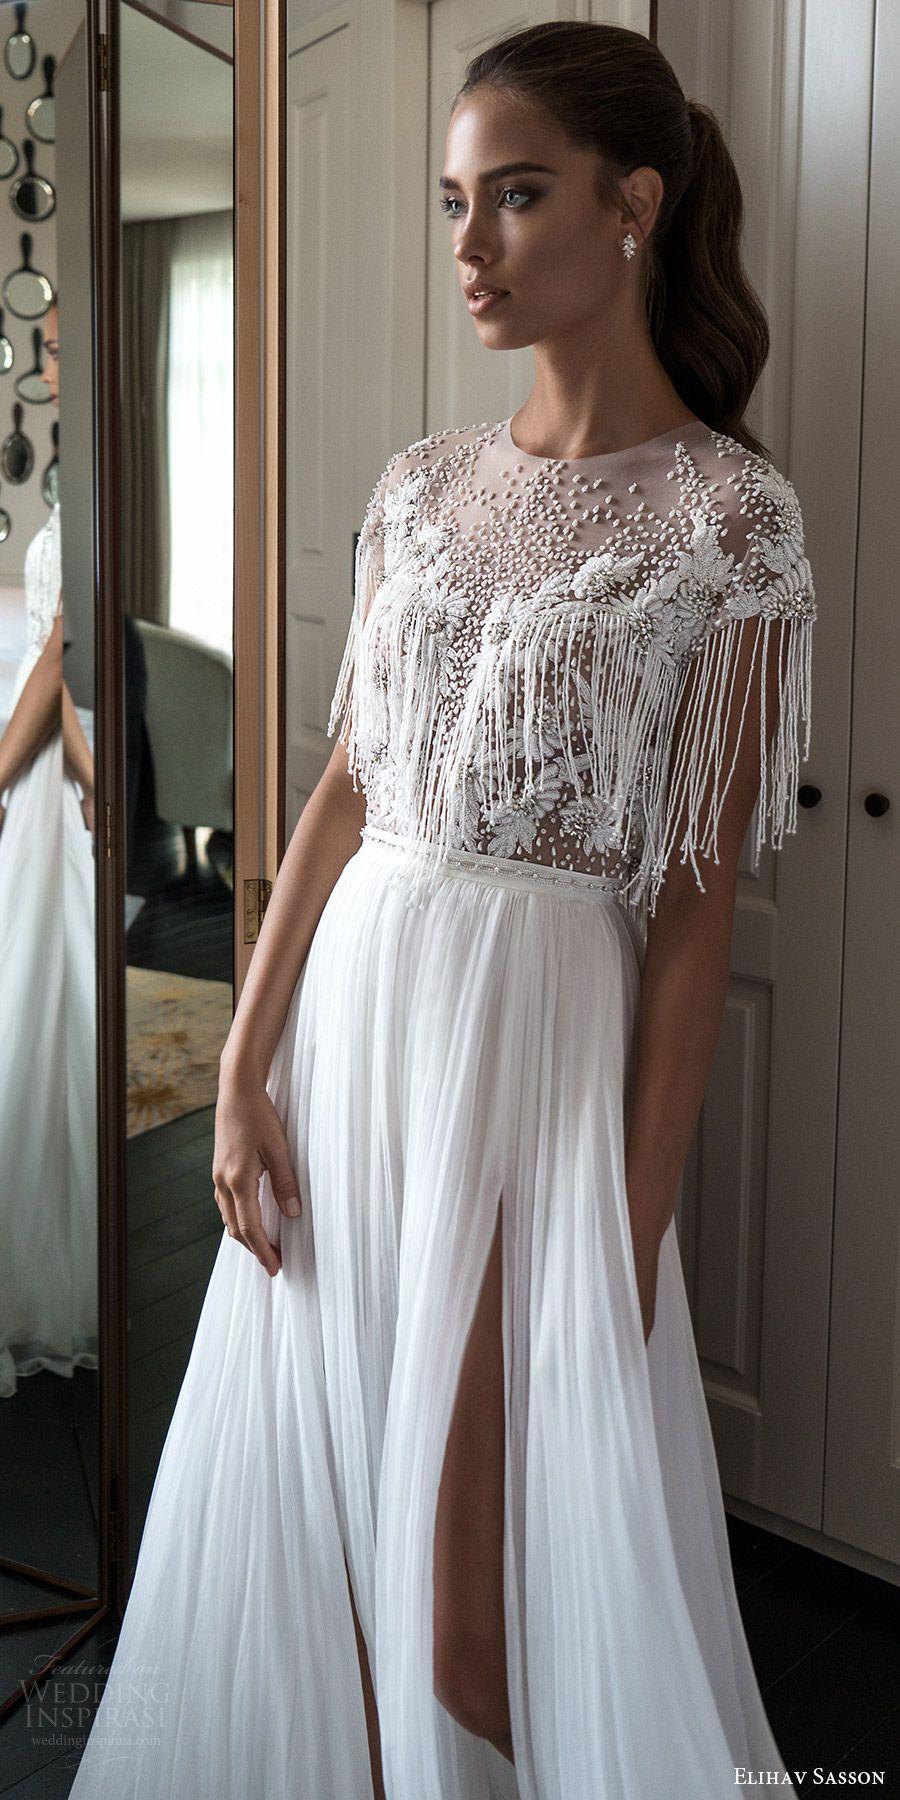 Elihav sasson spring bridal jewel neck cap sleeves fringe